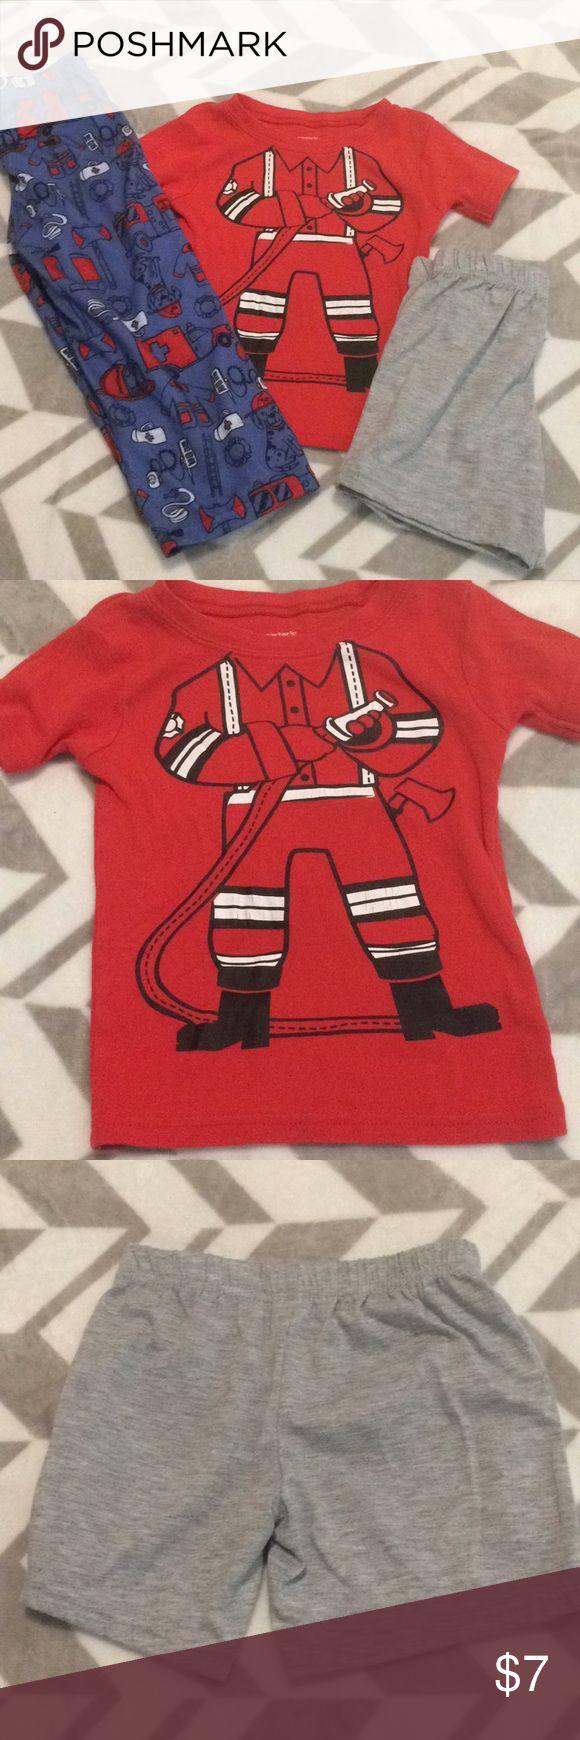 3pc boys pajama set Fireman shirt with short sleeves  Gray shorts Fireman print pants Carter's Pajamas Pajama Sets